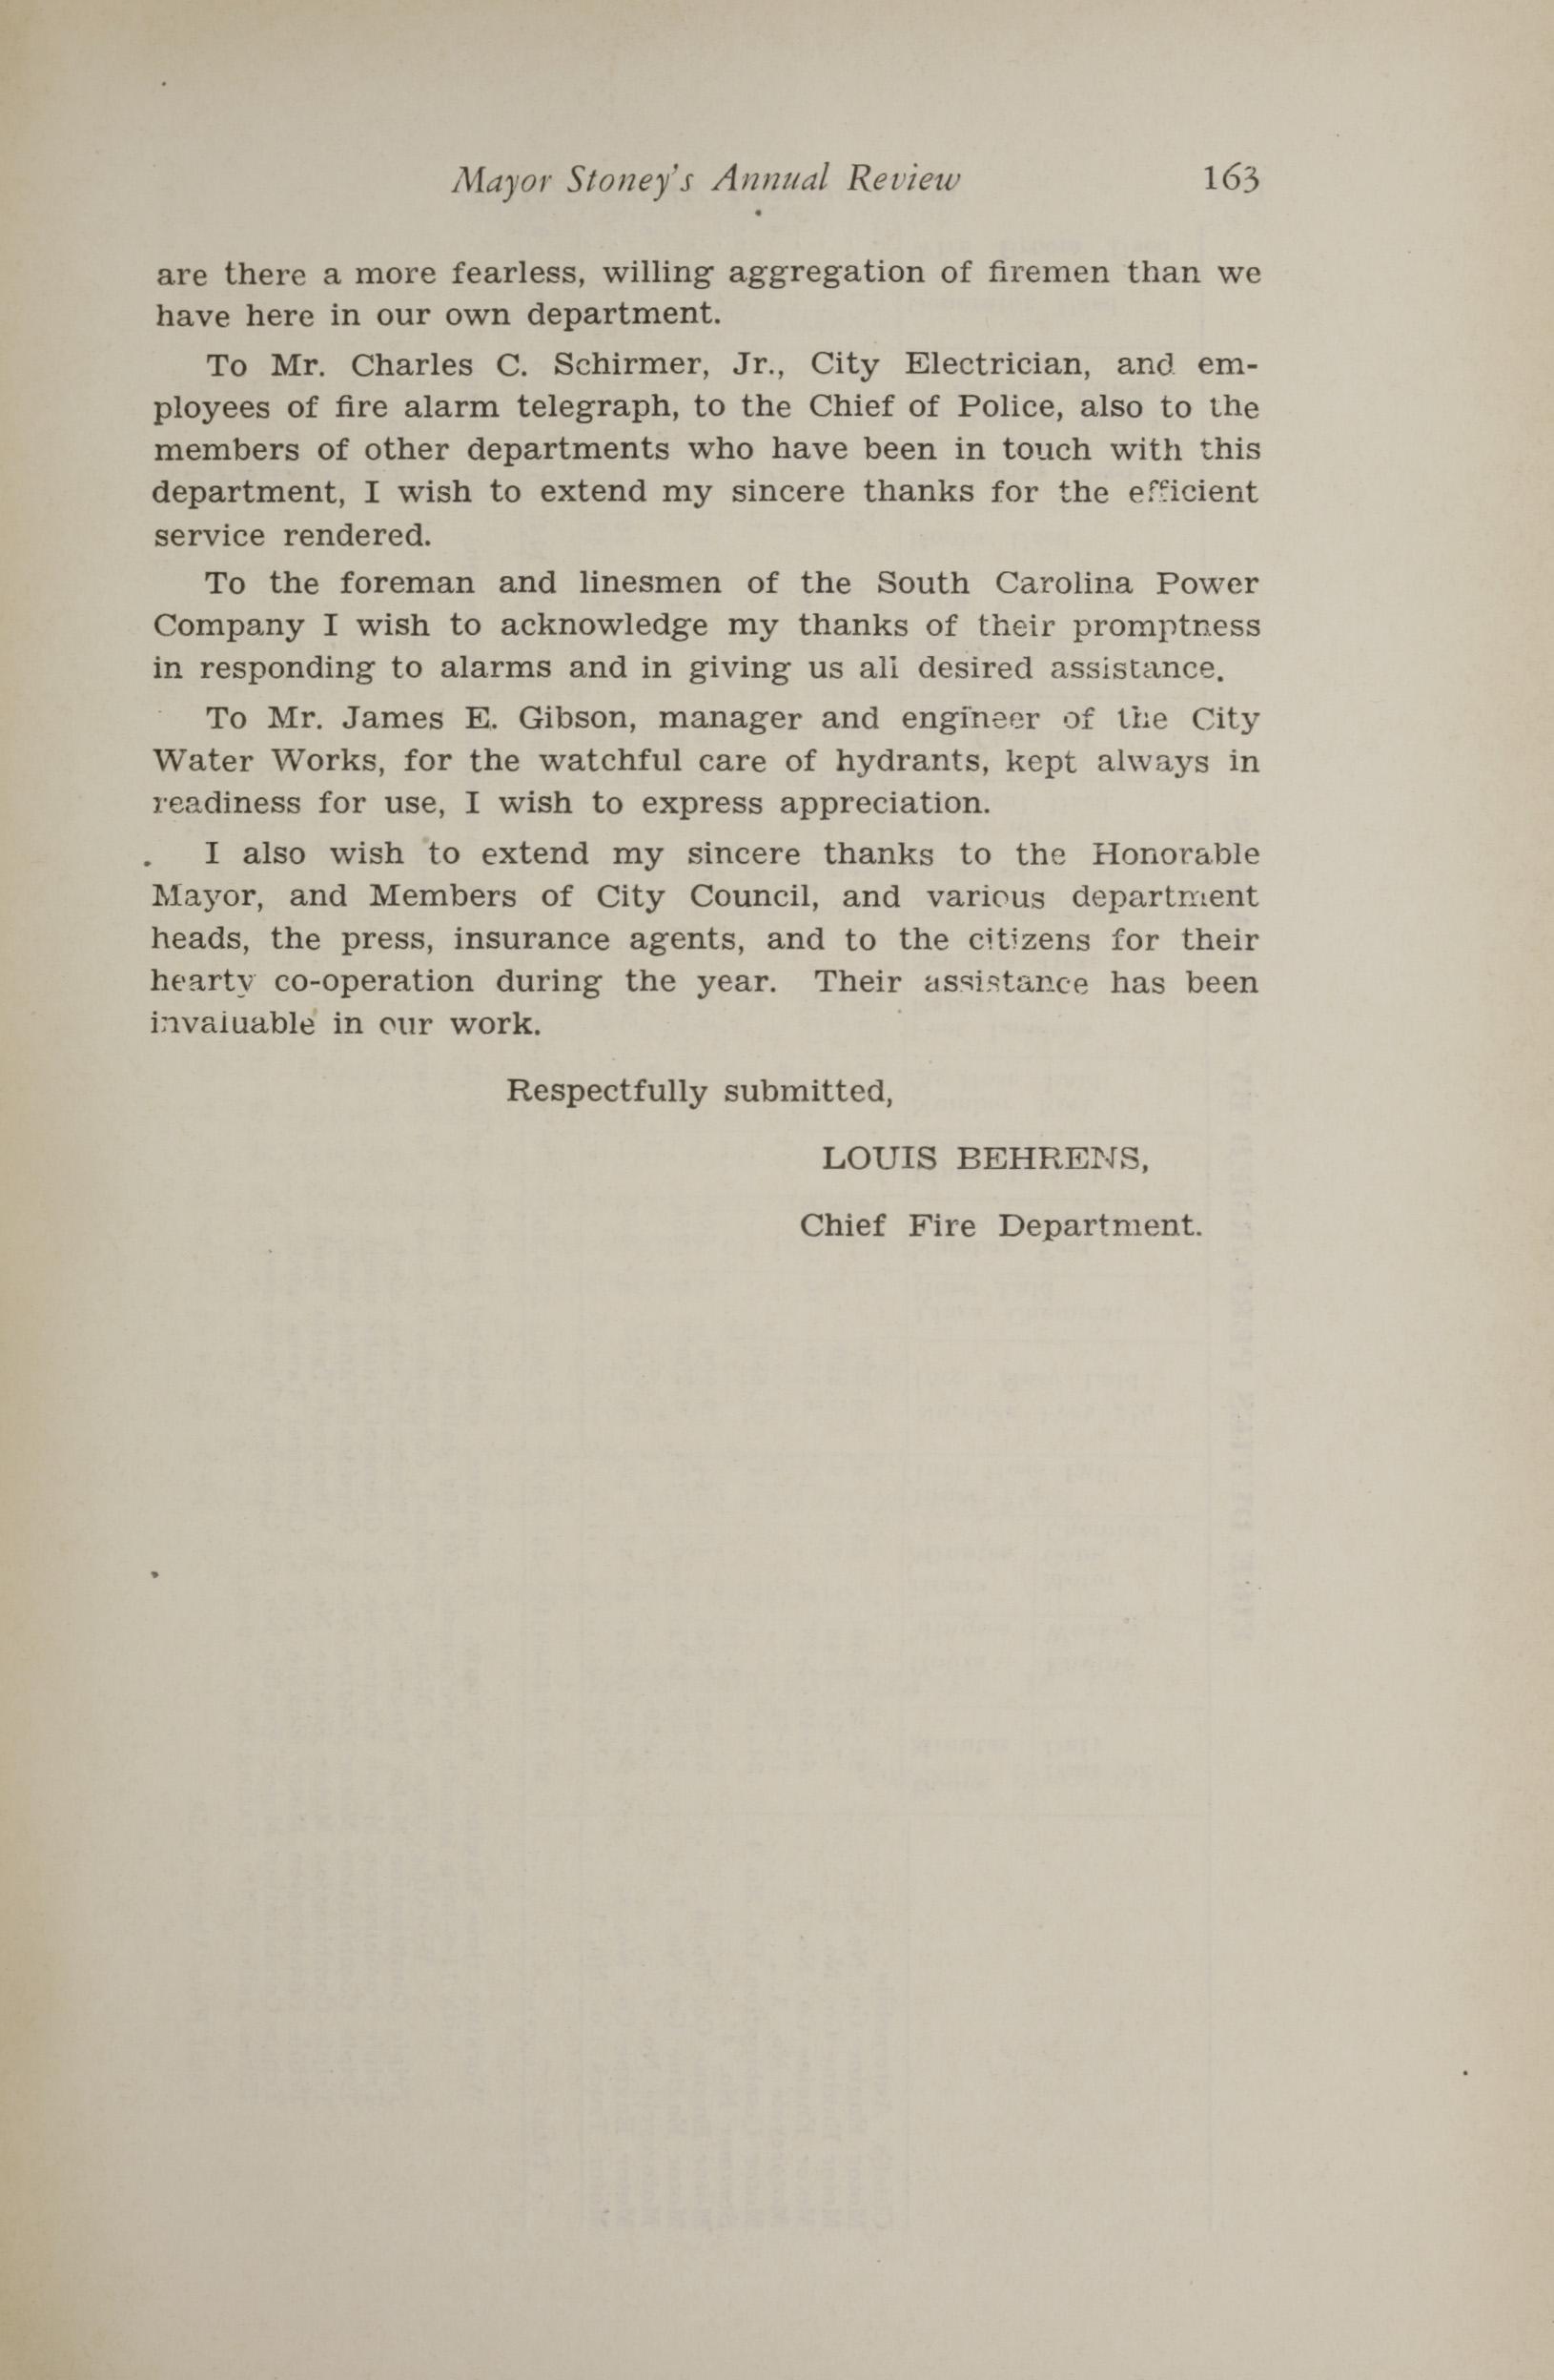 Charleston Yearbook, 1930, page 163